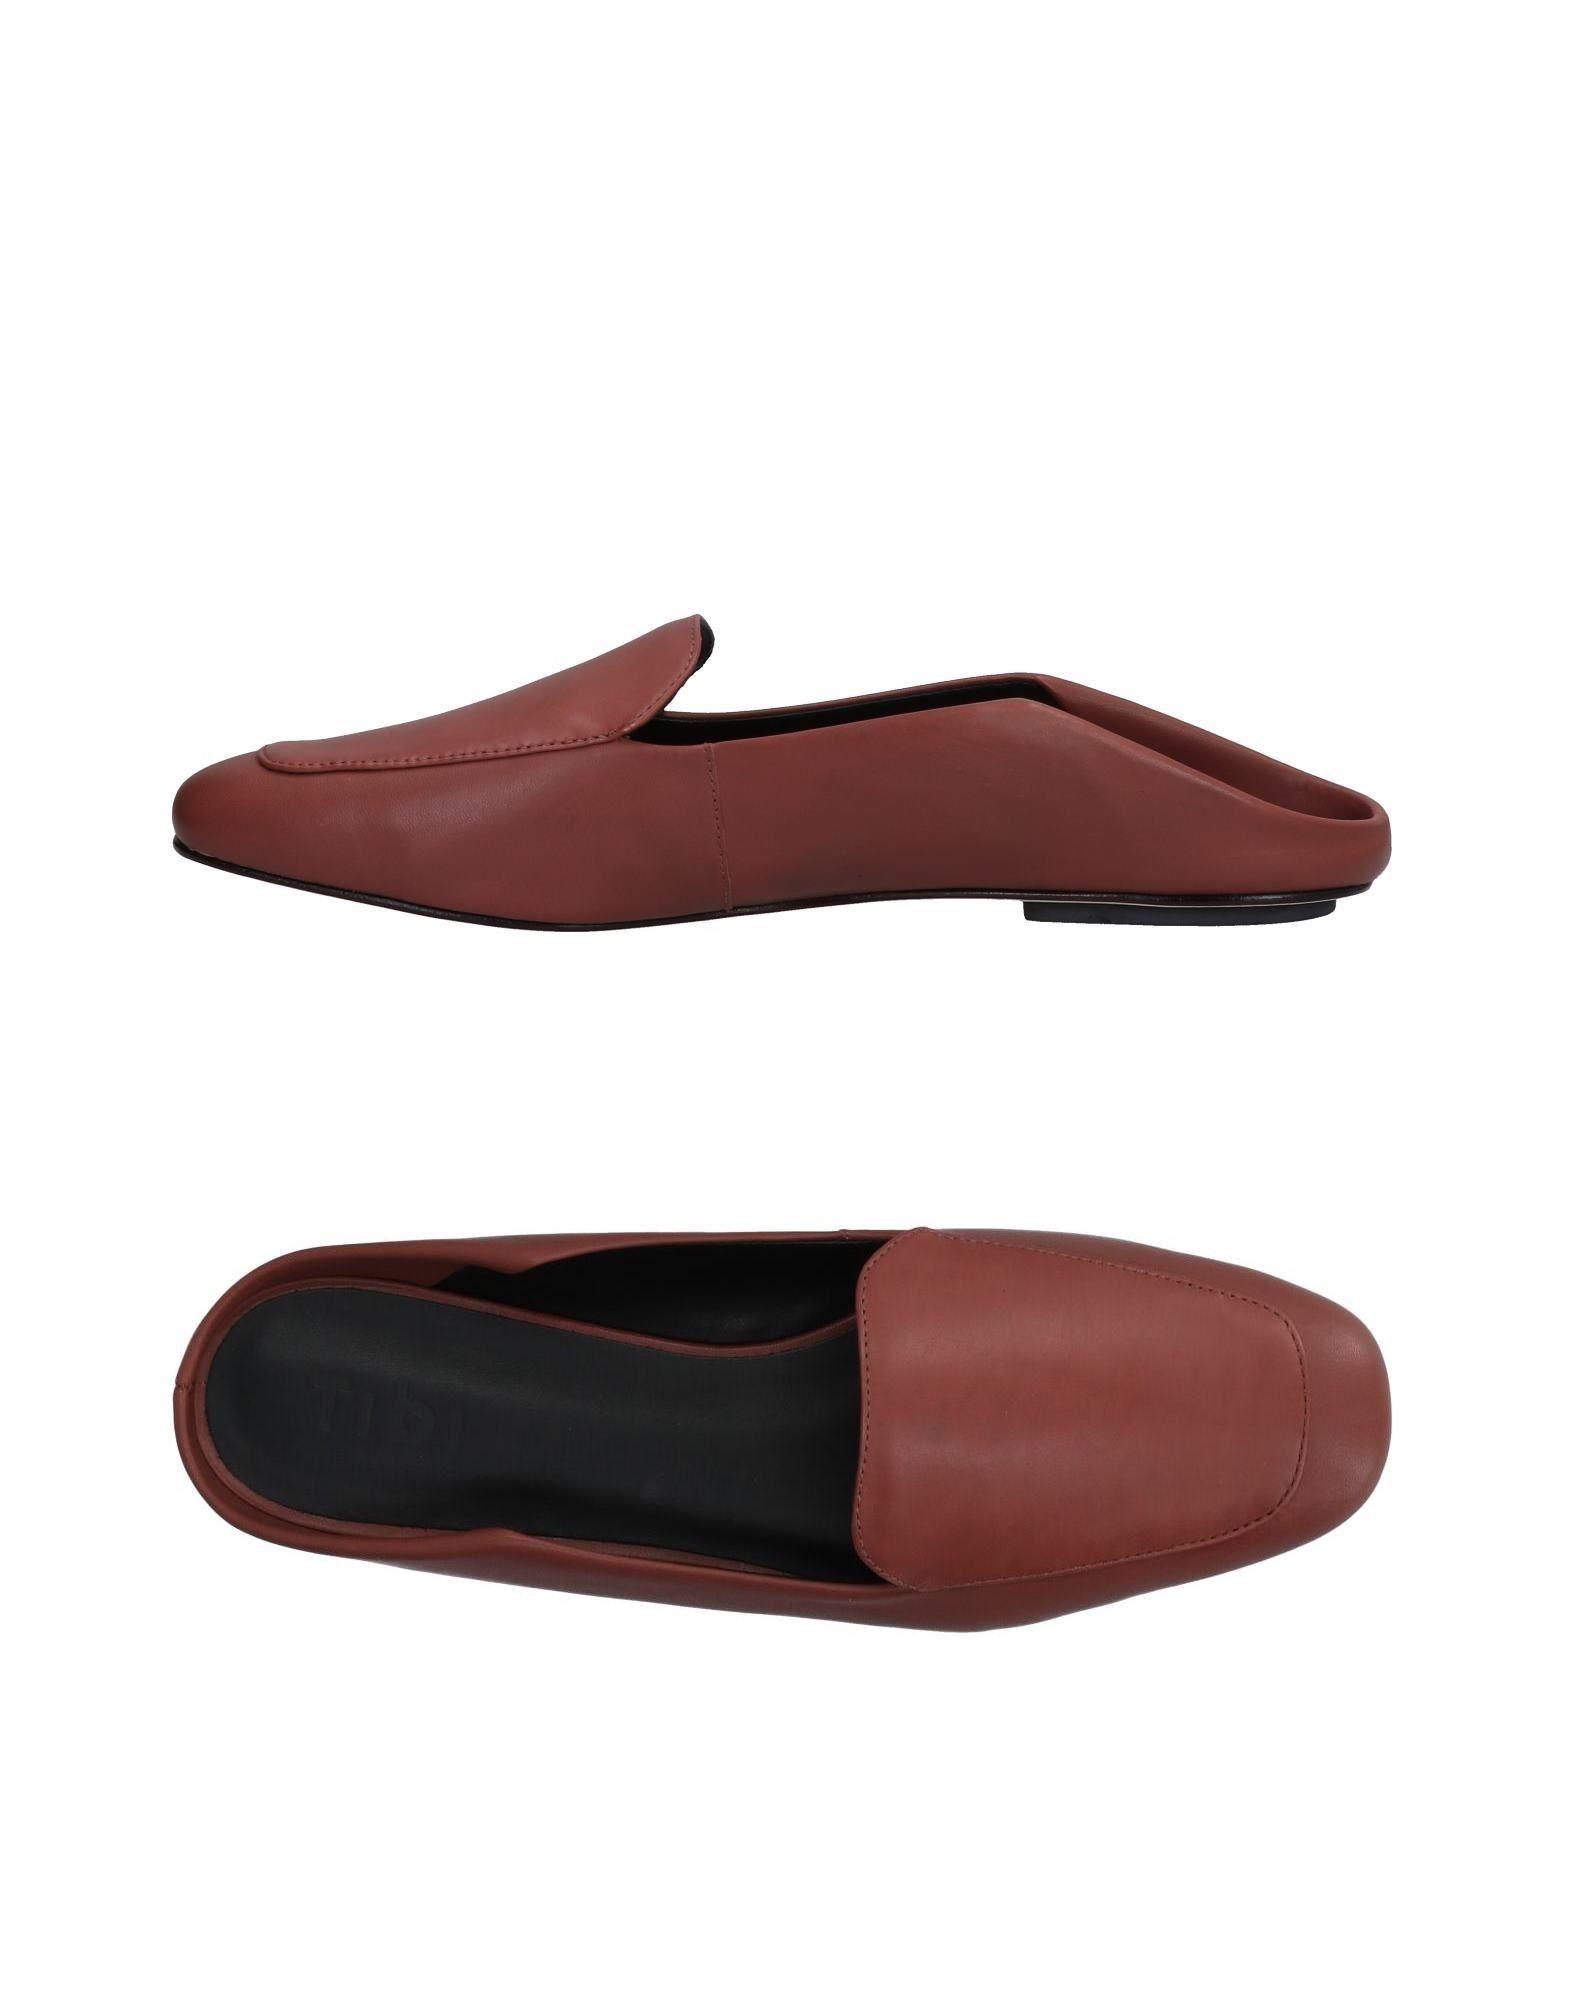 Stilvolle billige Schuhe Damen Tibi Pantoletten Damen Schuhe  11474908FS 545ffc